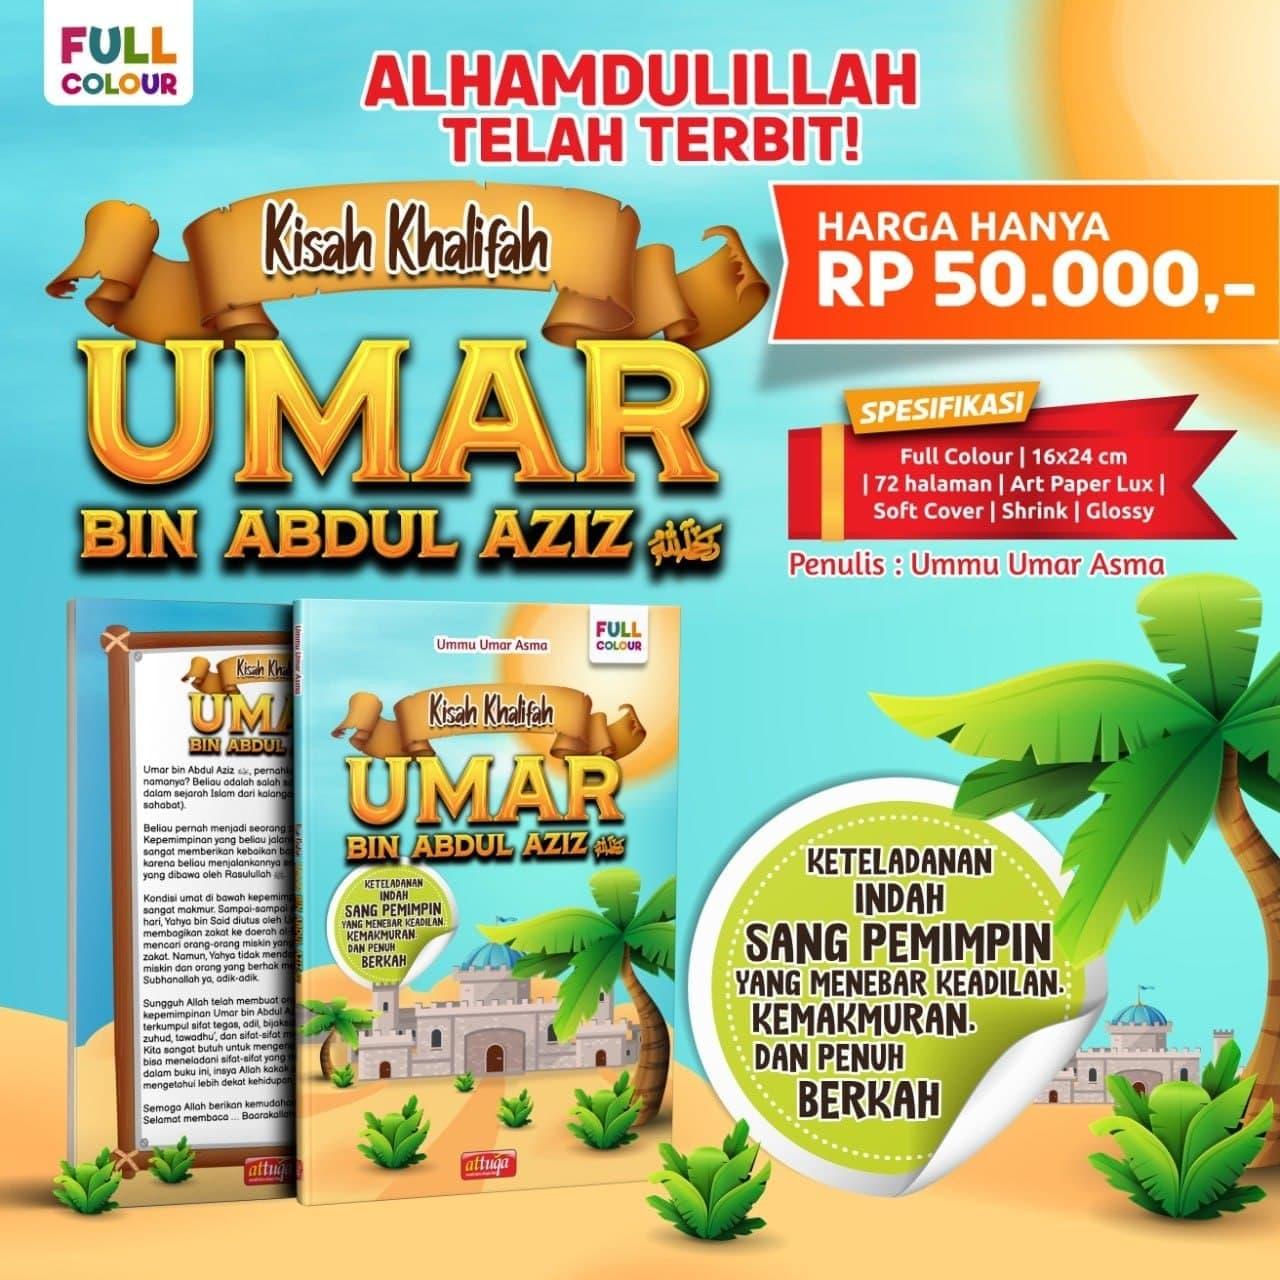 Buku Kisah Umar bin Abdul Aziz Full Color Attuqa